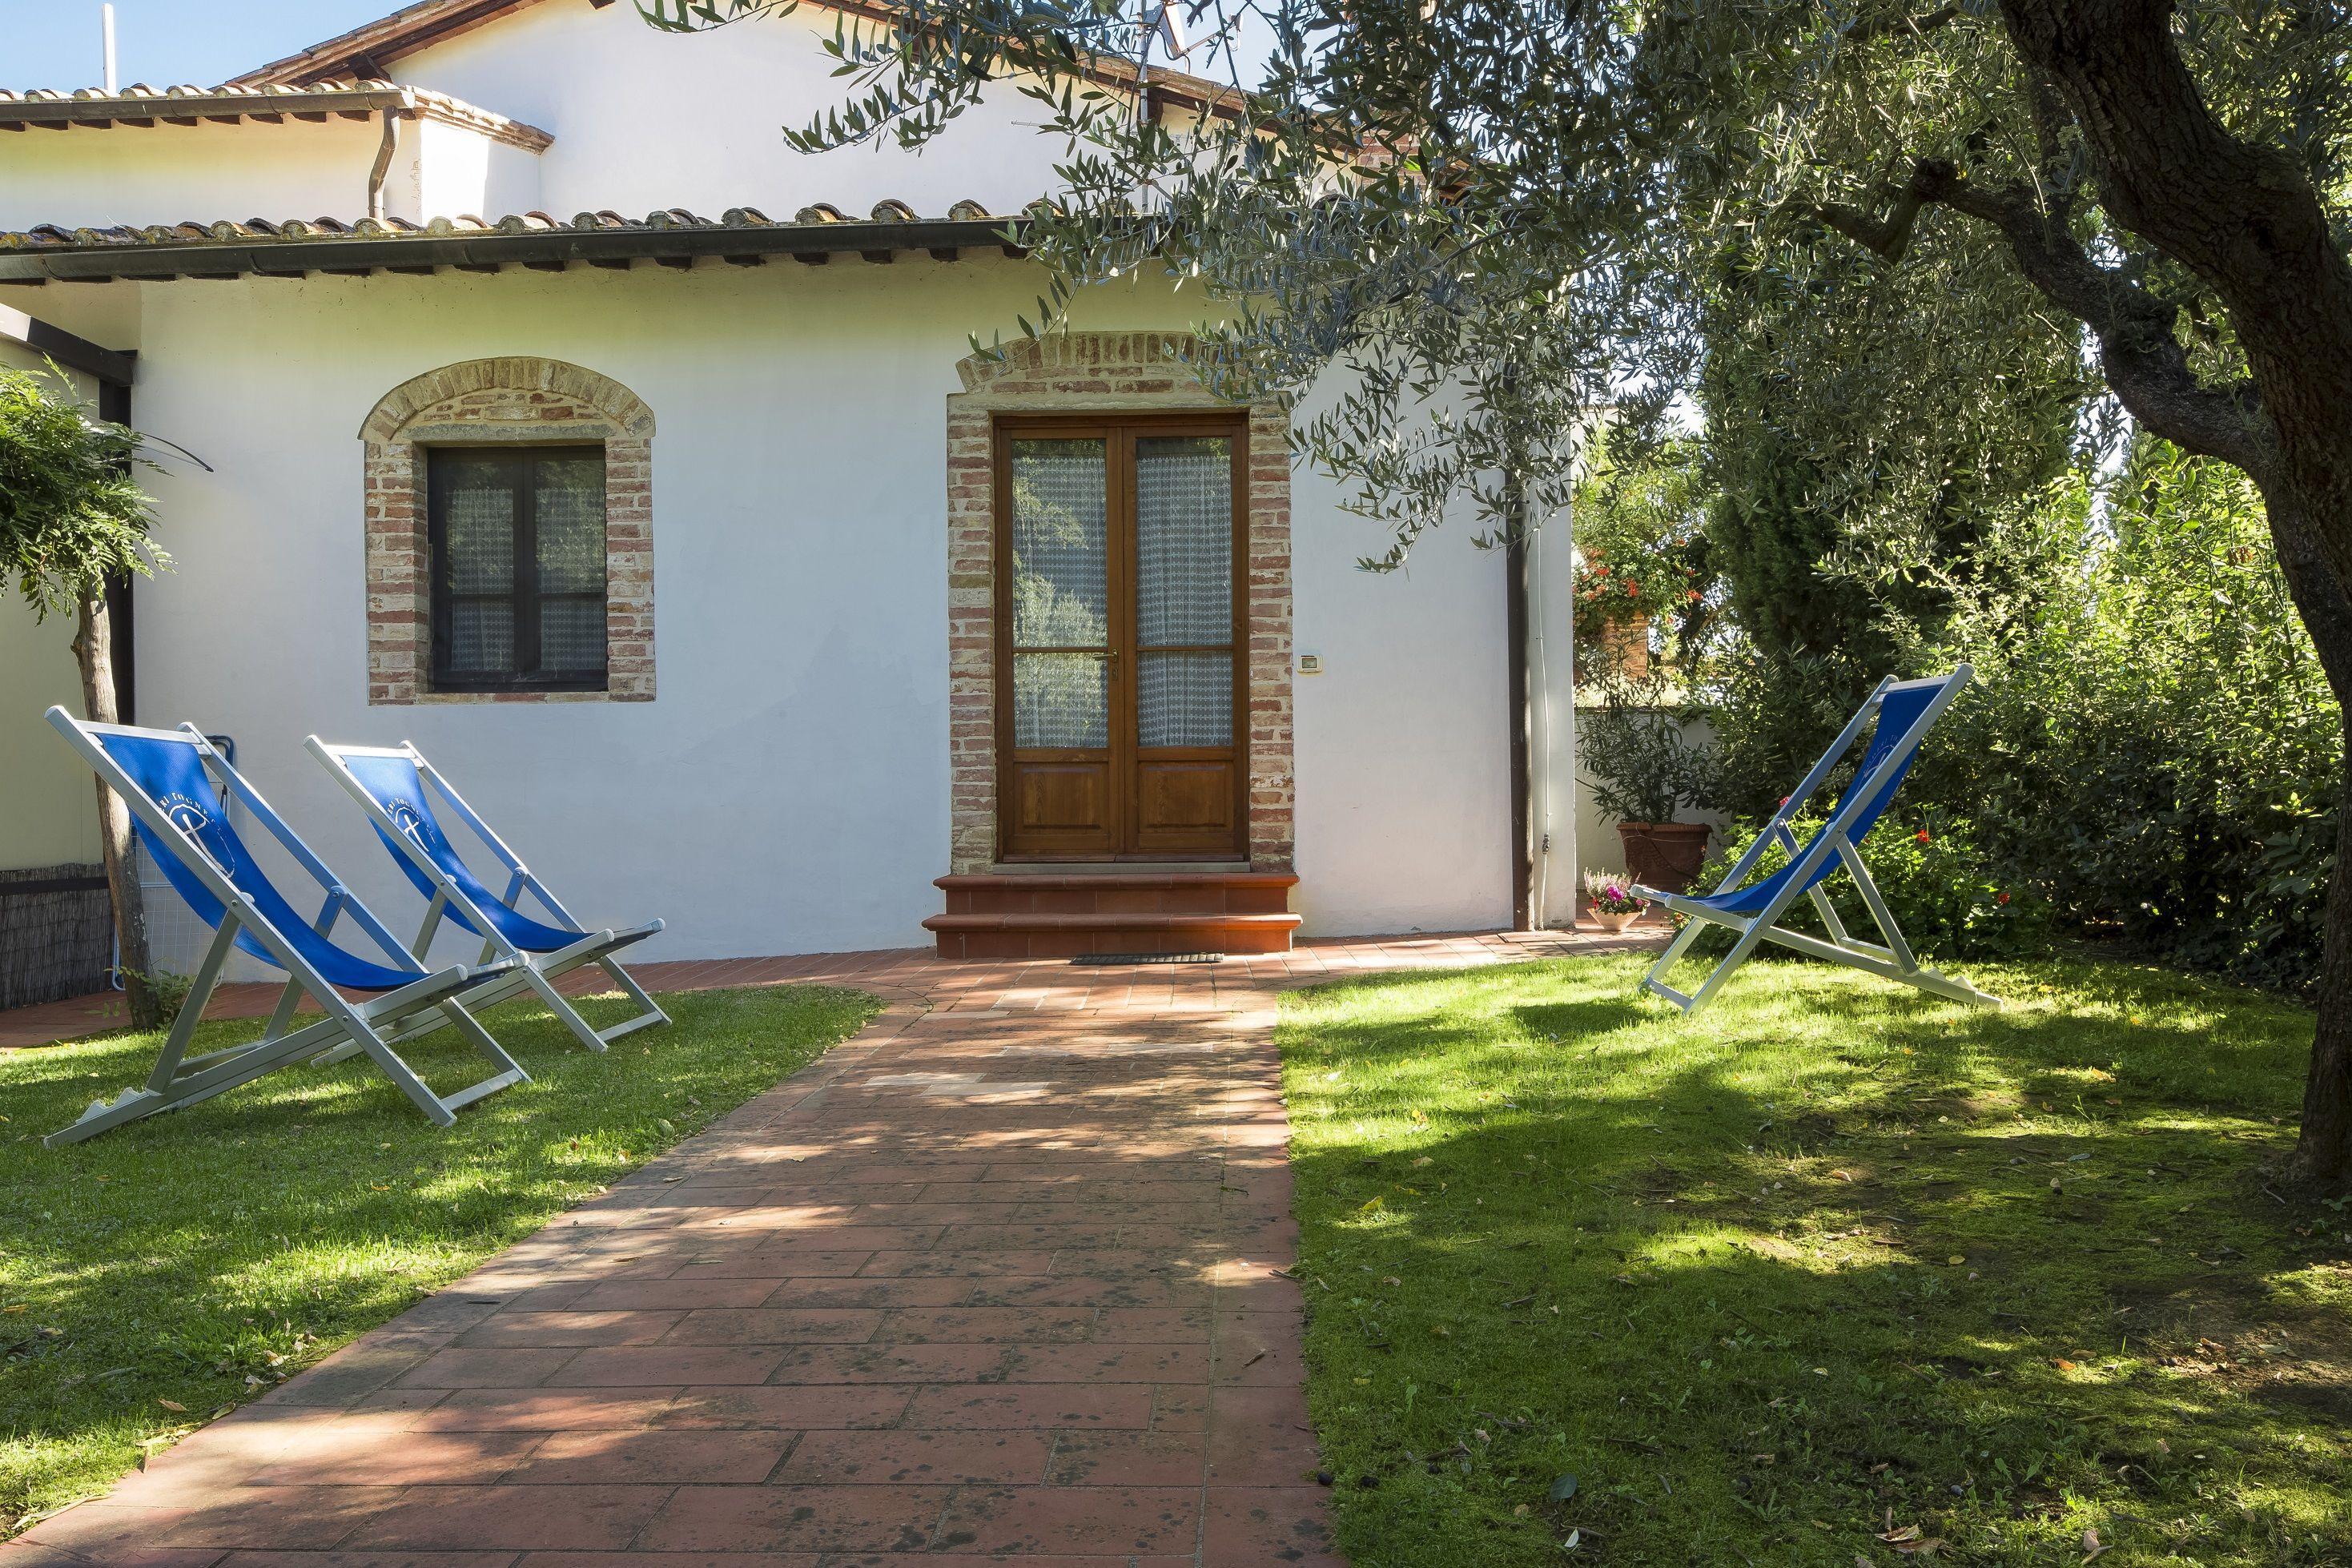 Apartment Agriturismo Il Sapito - Cherubini Holiday Home photo 16874830